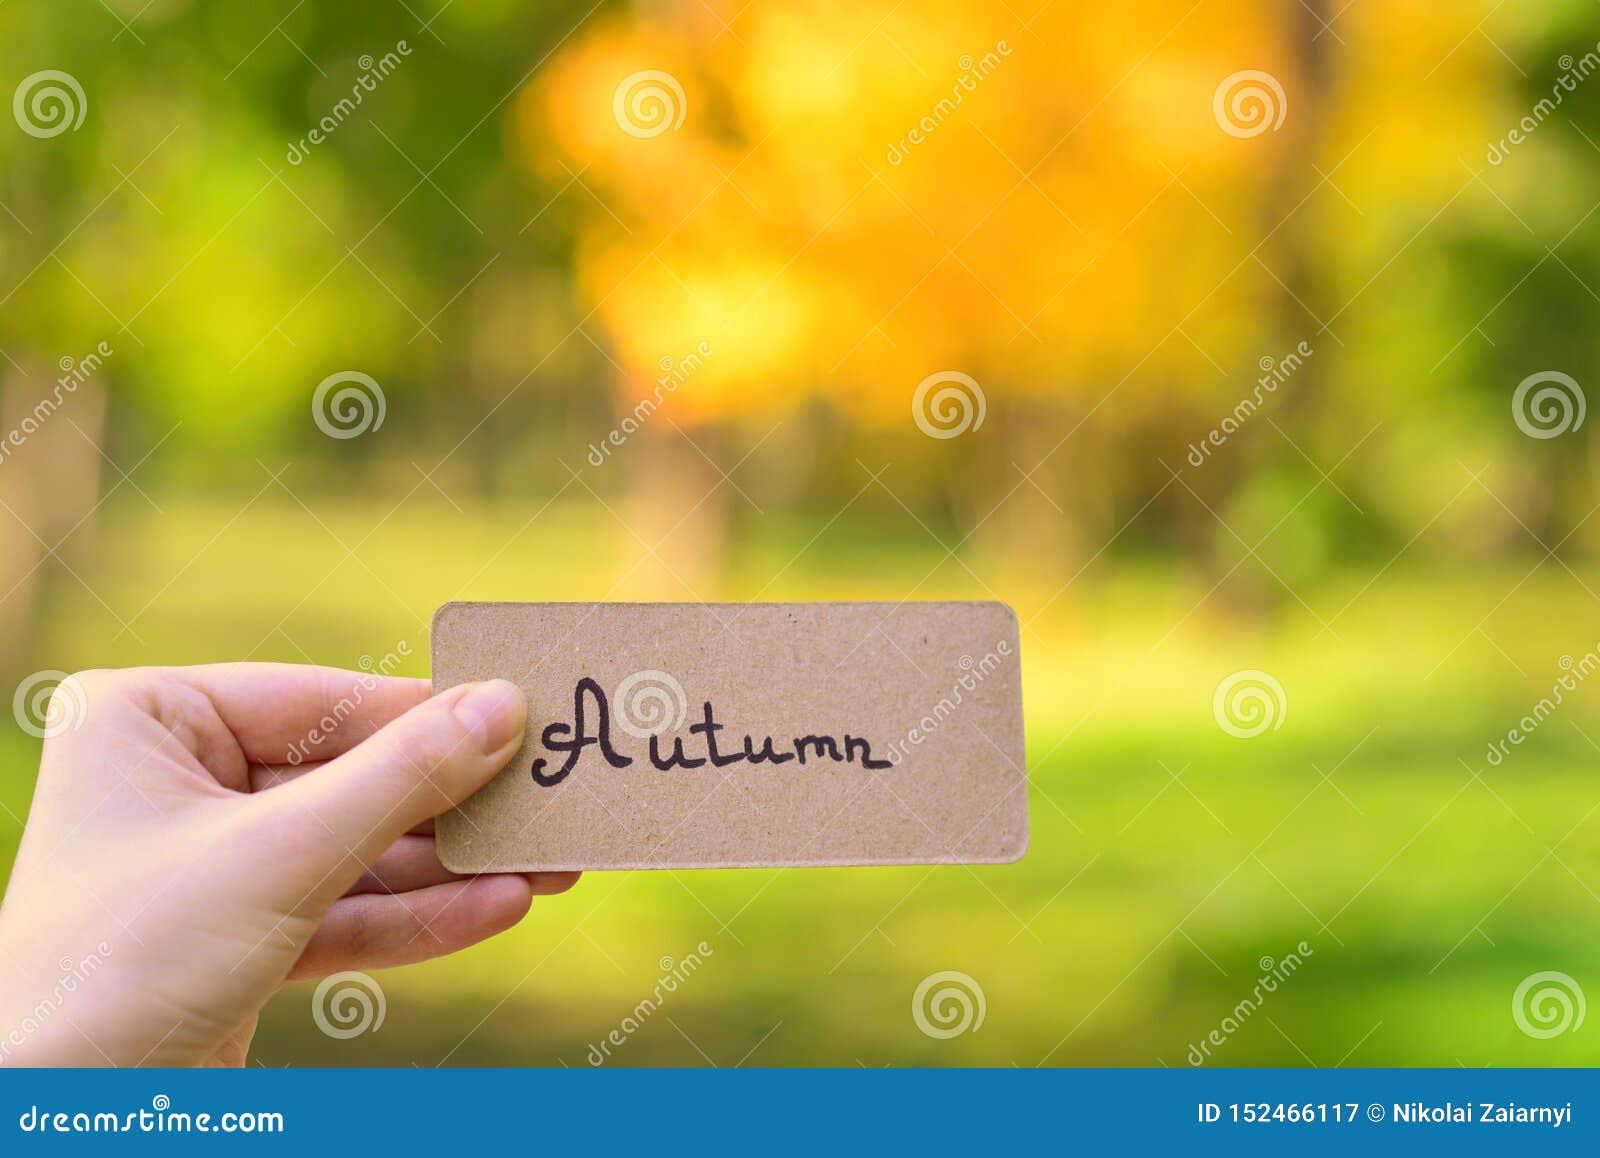 Autumn text on a card. Girl holding card in autumn park in sunny rays